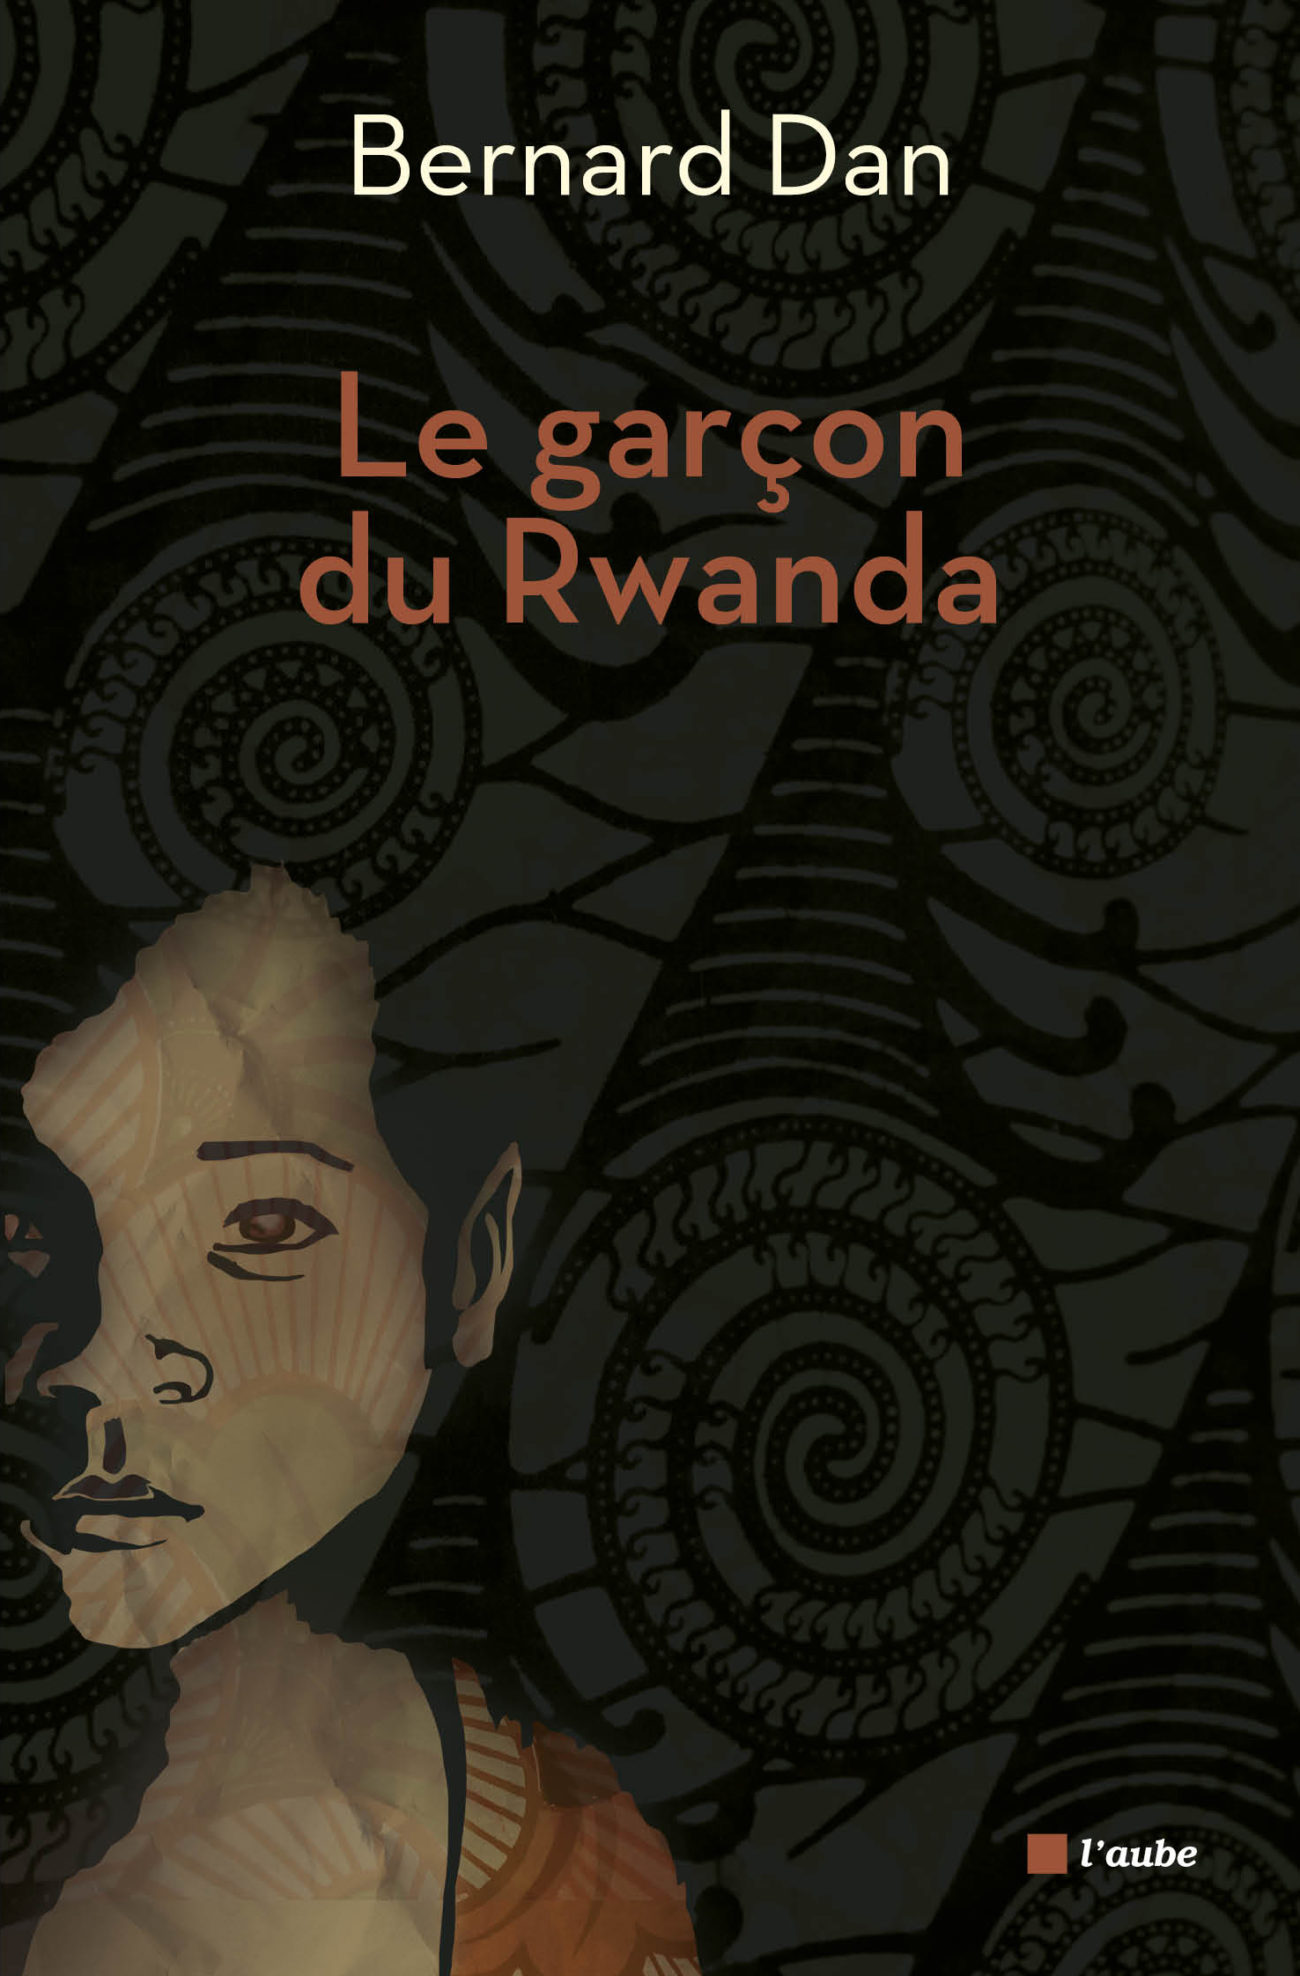 Le garçon du Rwanda